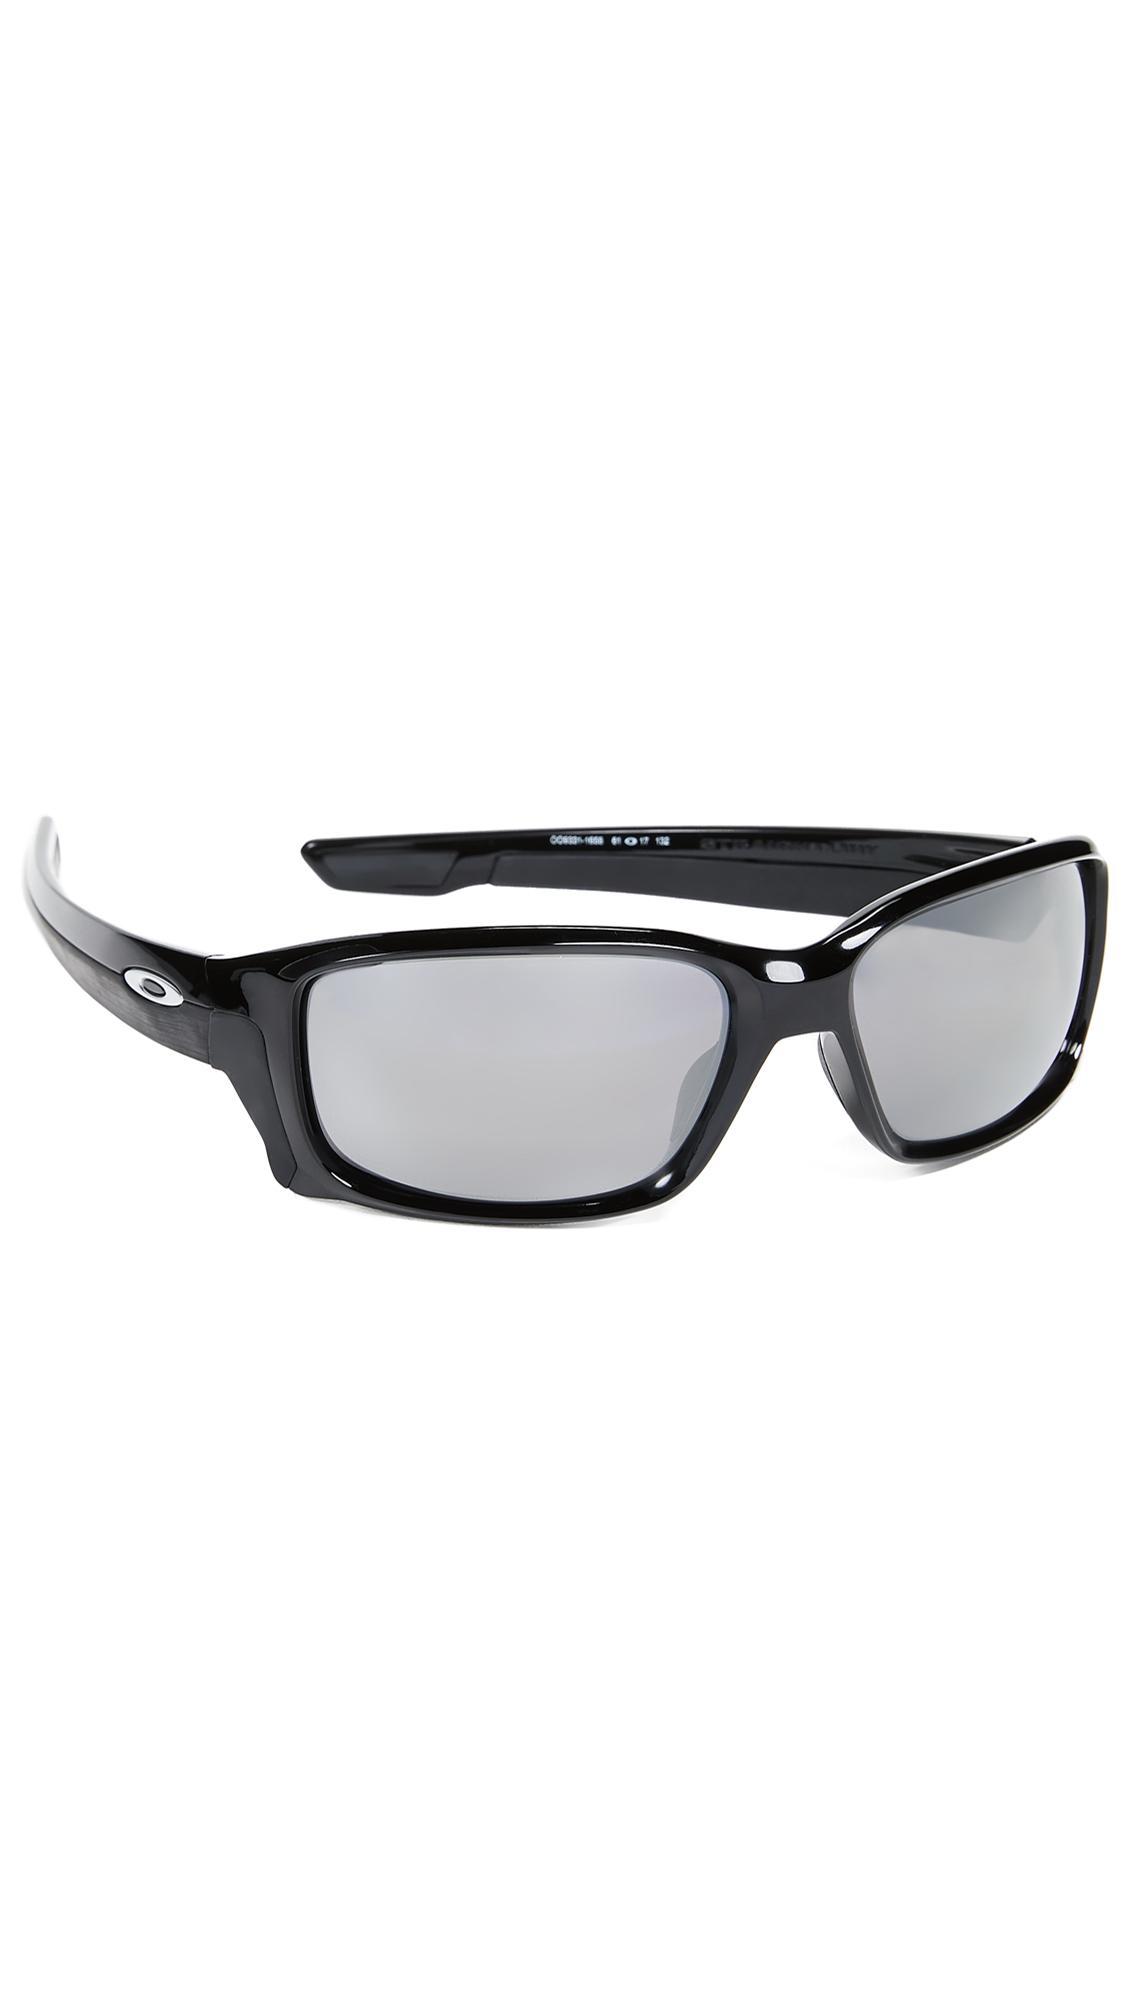 b475410383 Oakley Straightlink Prizm Polarized Sunglasses in Black for Men - Lyst